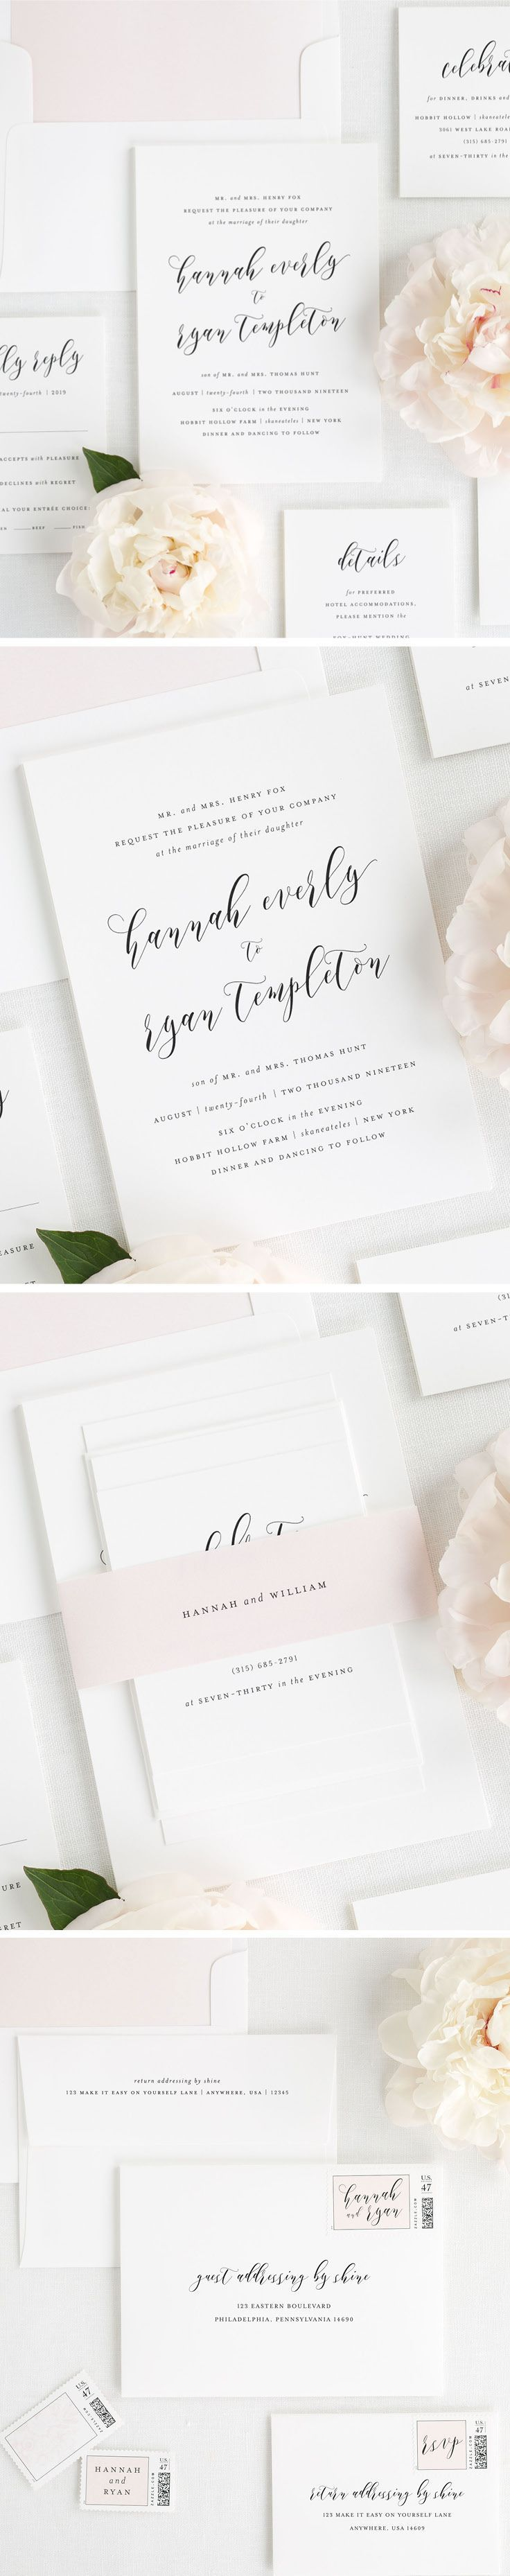 Everly Wedding Invitations | Wedding, Romantic wedding invitations ...